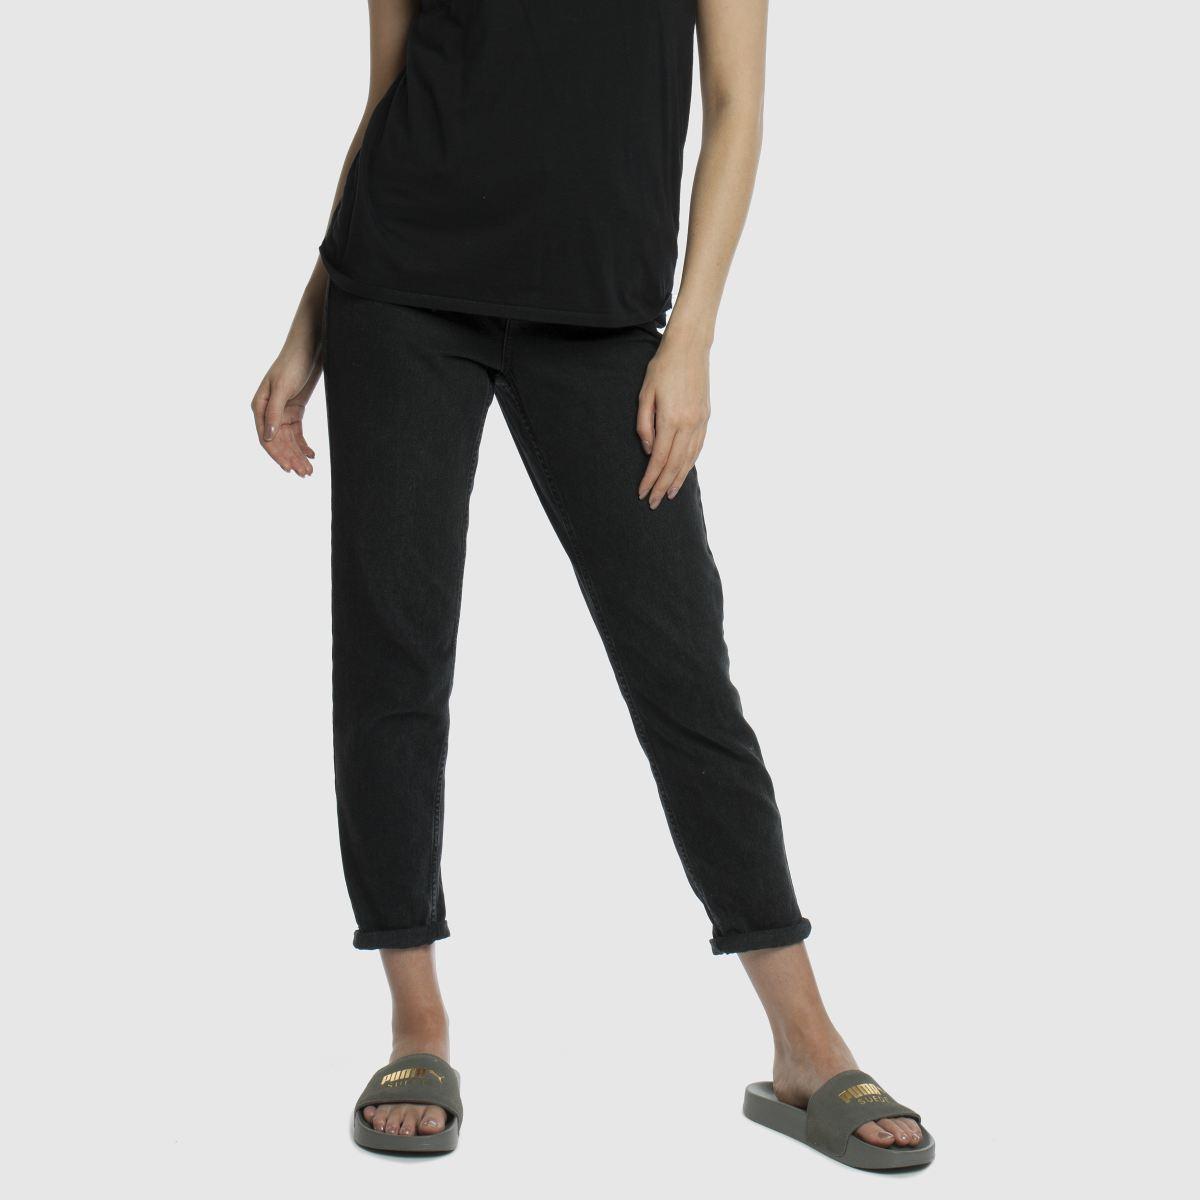 Damen Khaki puma Leadcat Suede Sandalen | schuh Gute Qualität beliebte Schuhe